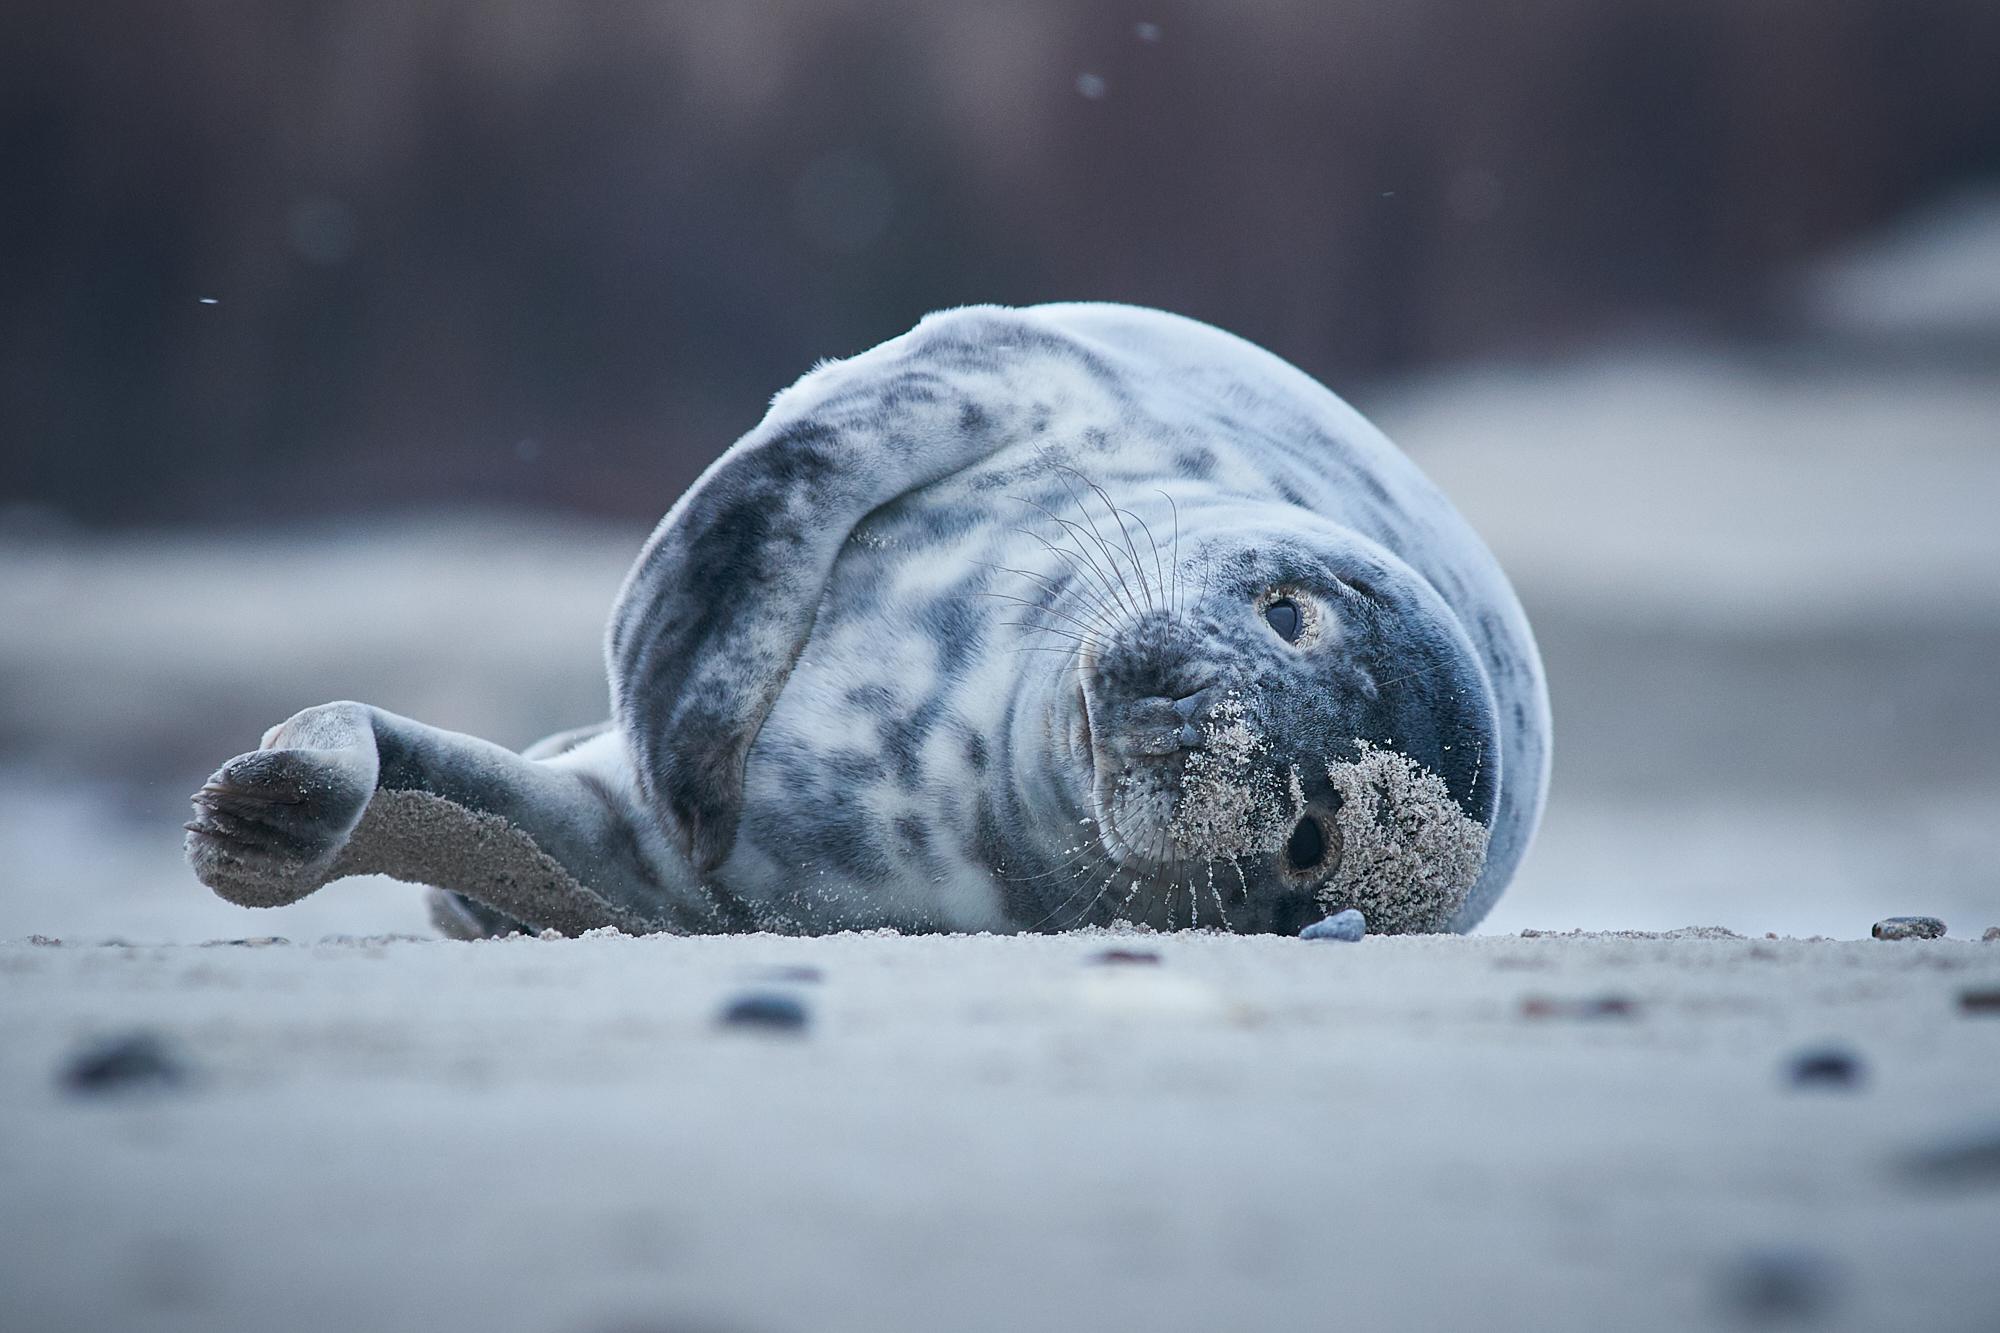 DMZ_4557 - Seal.jpg